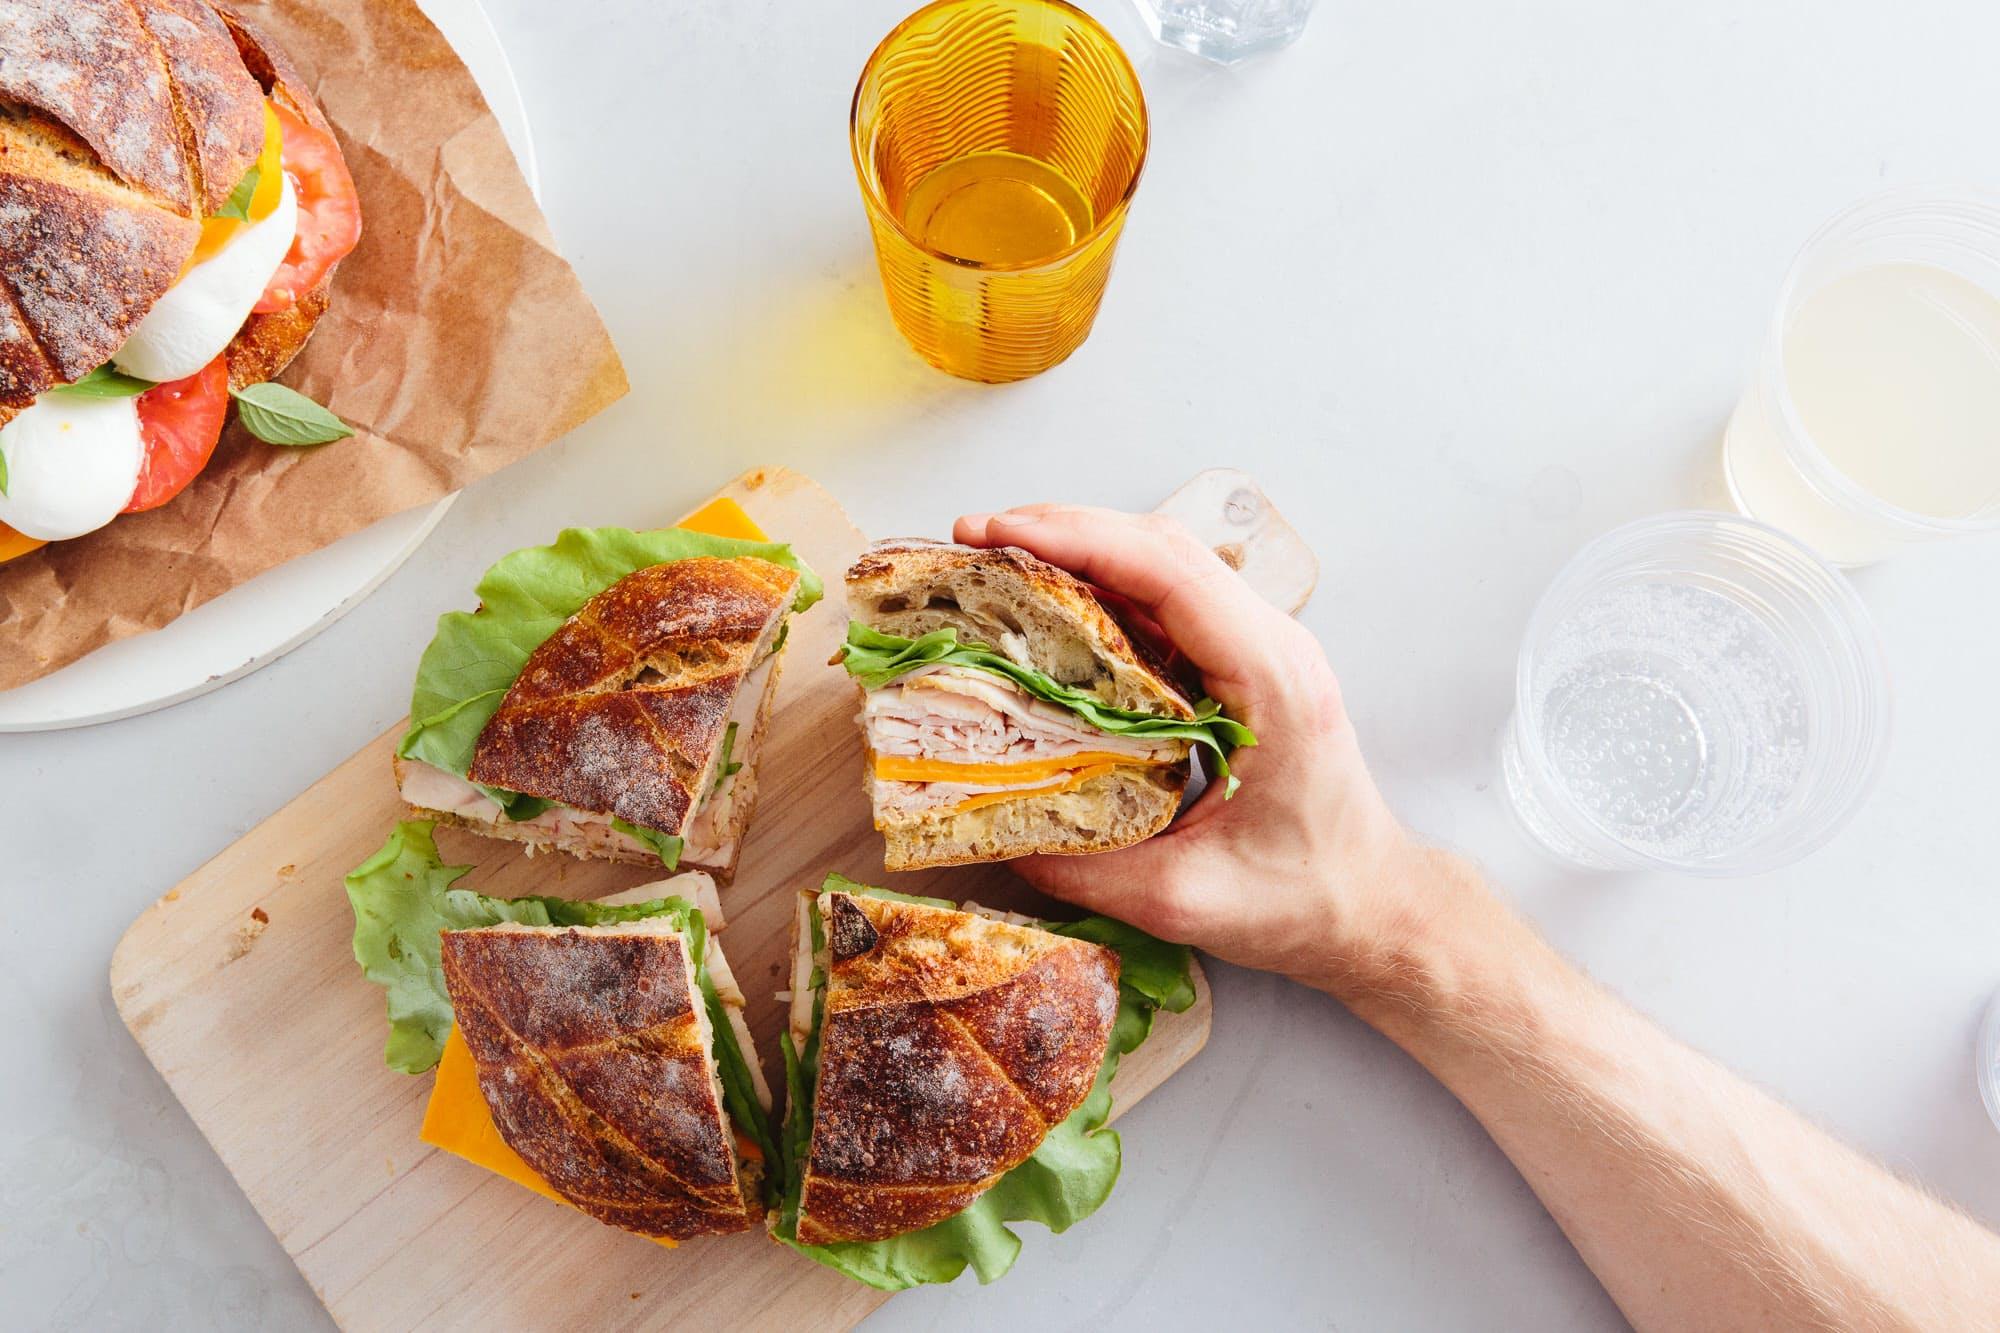 Easy Rosemary-Rubbed Pork Chops